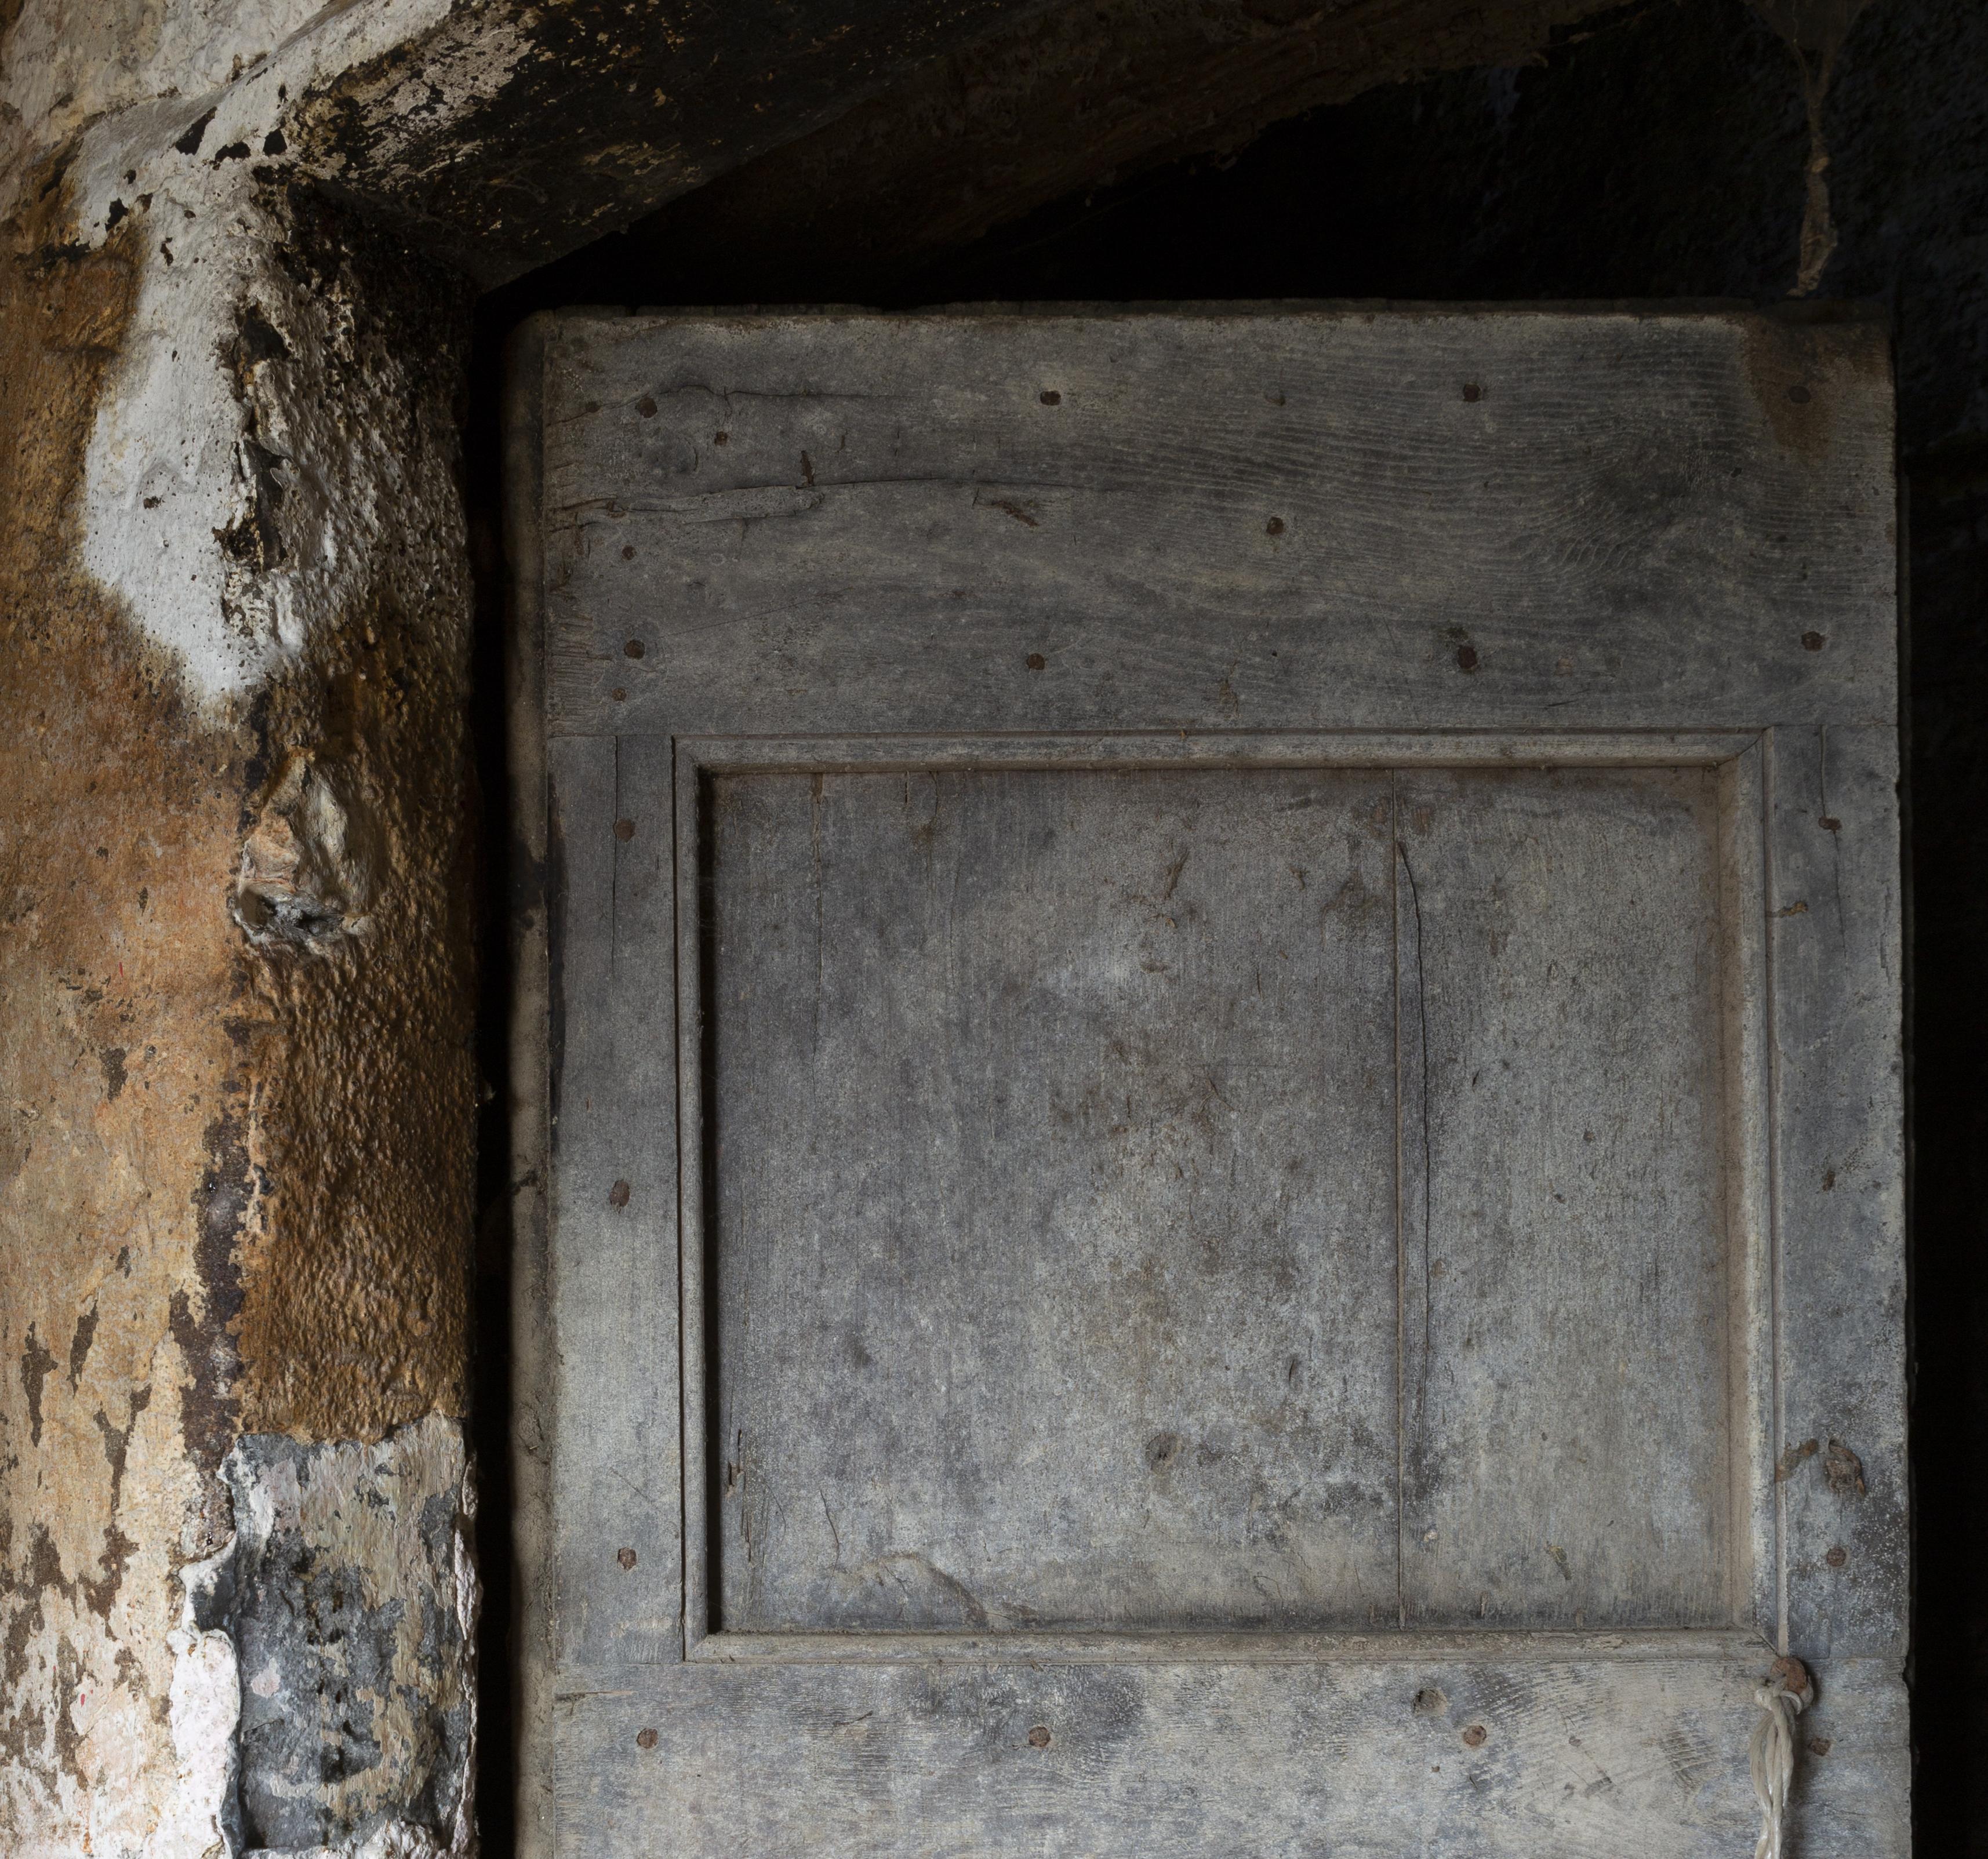 Porta Pianspessa, Generoso